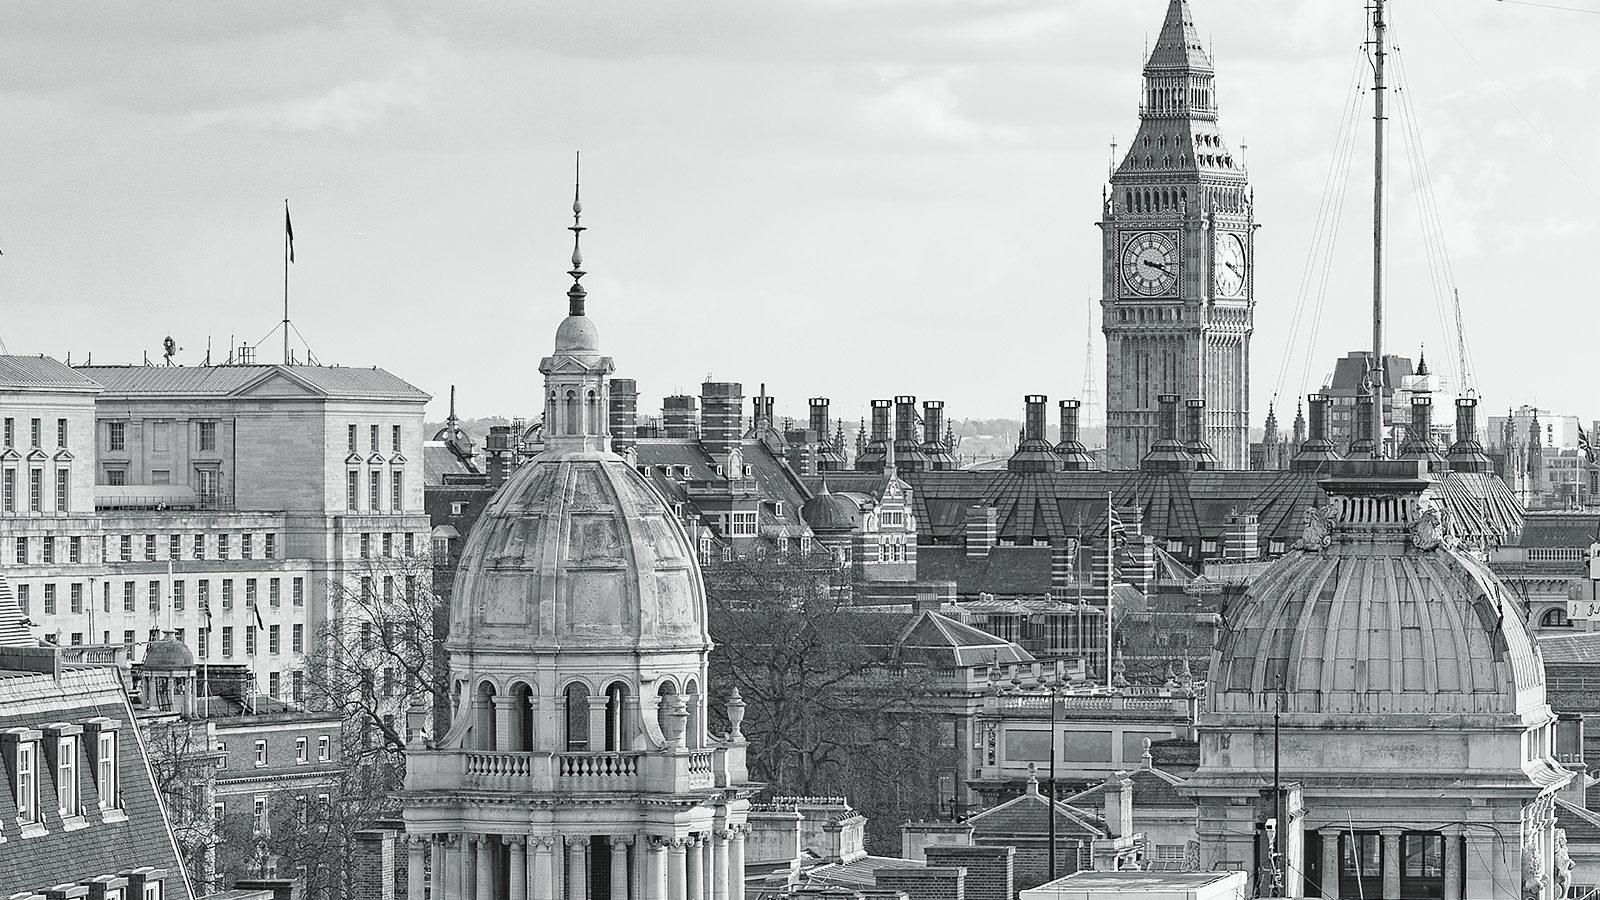 Admiralty Arch Day - Detail featuring Big Ben. London Black & White Fine Art Photograph.